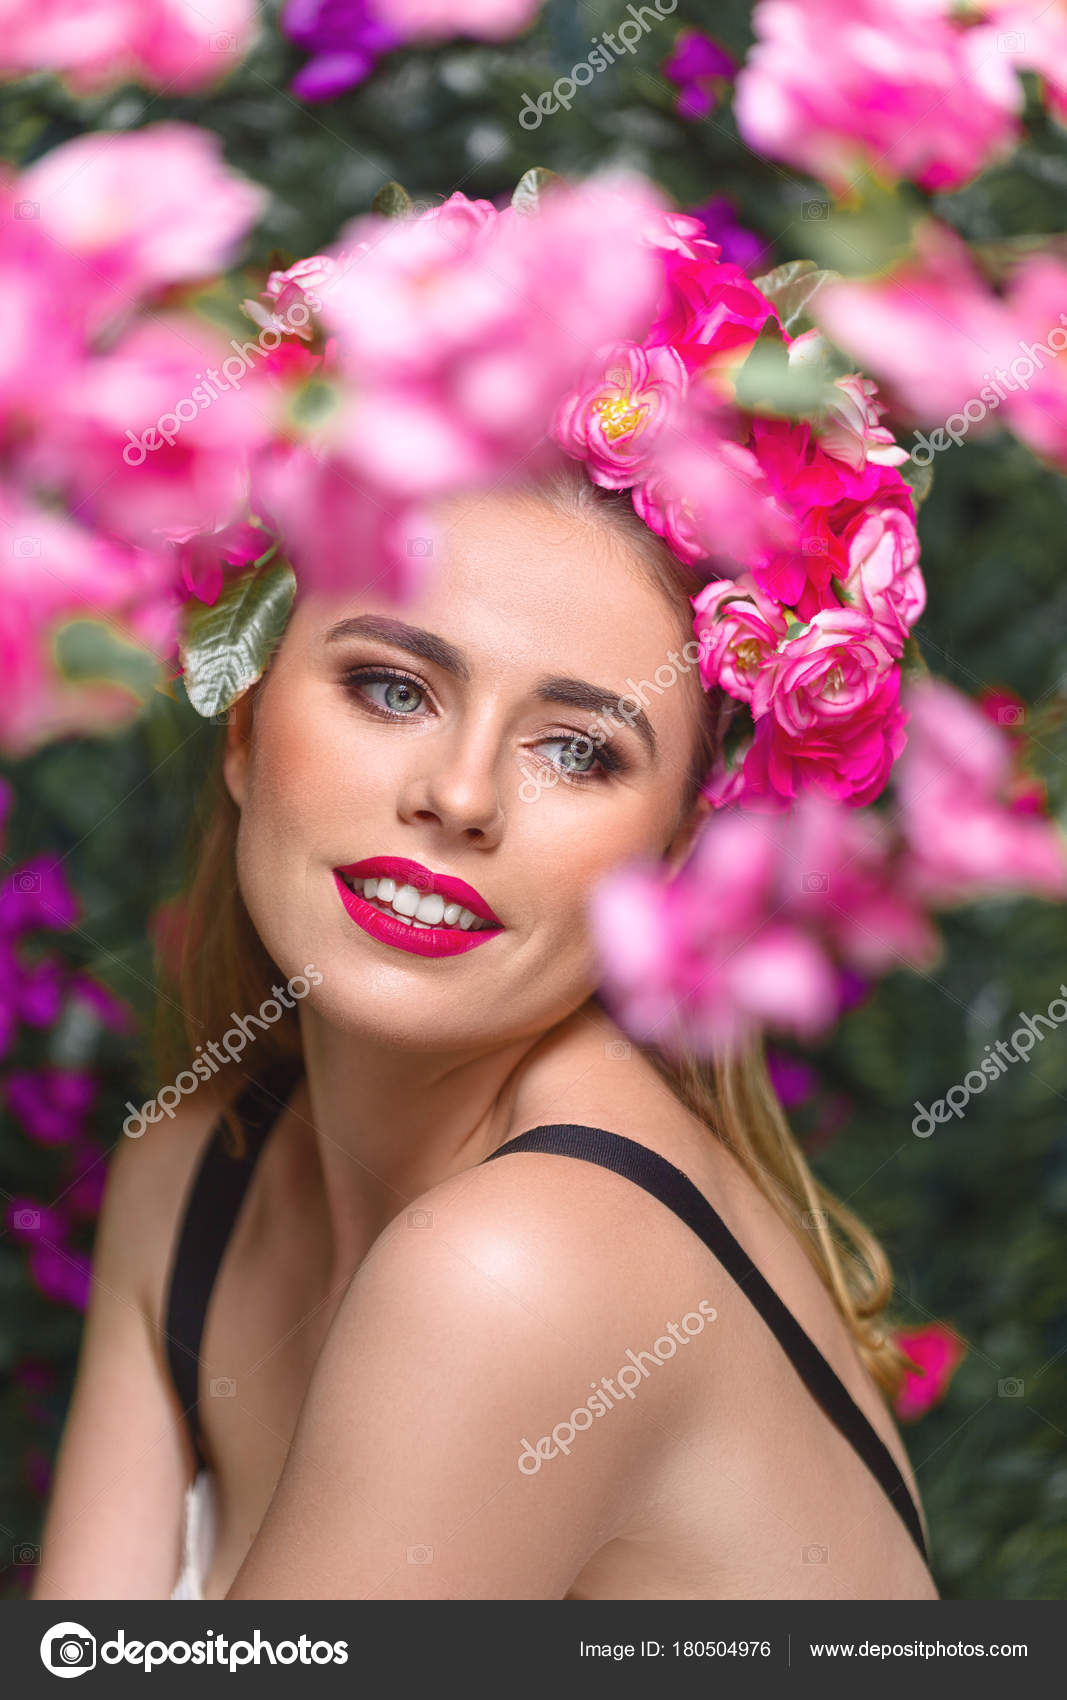 Beautiful woman with flowers wreath stock photo avesun 180504976 beautiful woman with flowers wreath stock photo izmirmasajfo